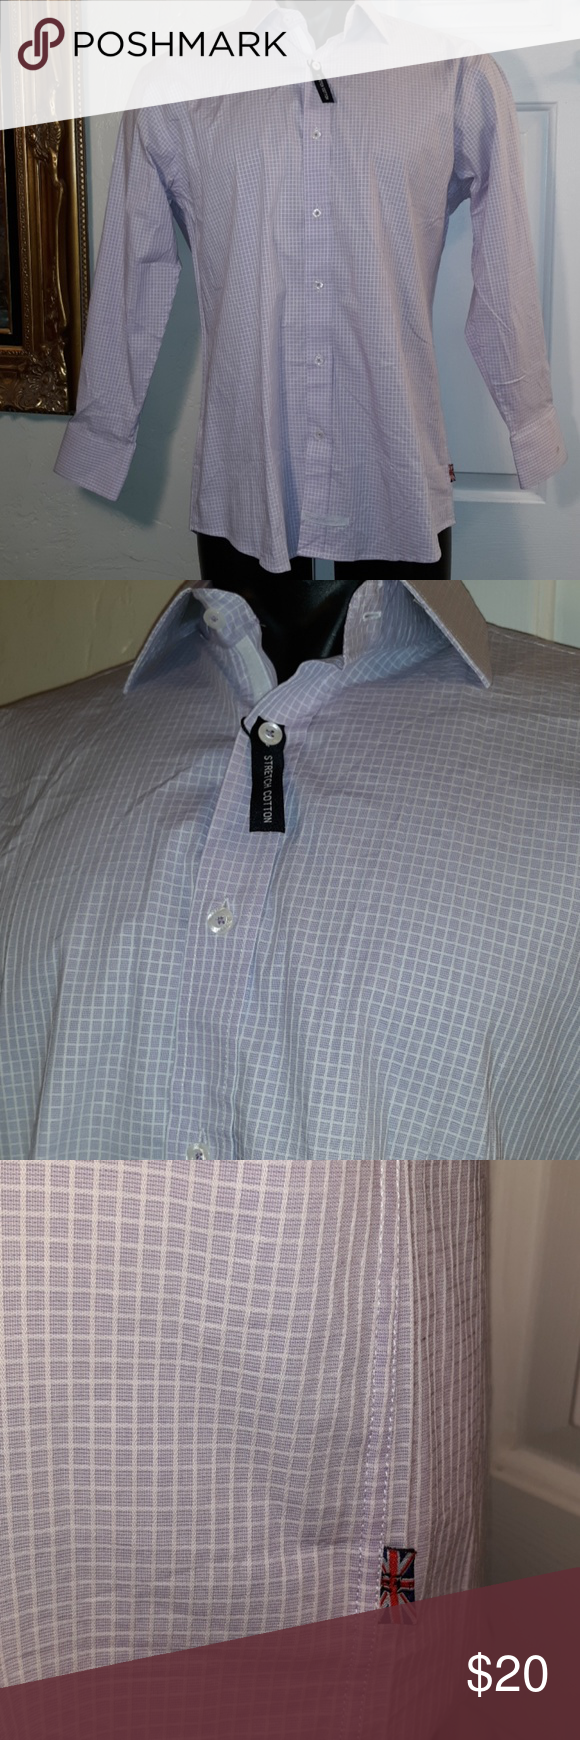 English Laundry Mens Dress Shirt Nwot Mens Shirt Dress Checkered Dress Shirts Laundry Shirts [ 1740 x 580 Pixel ]